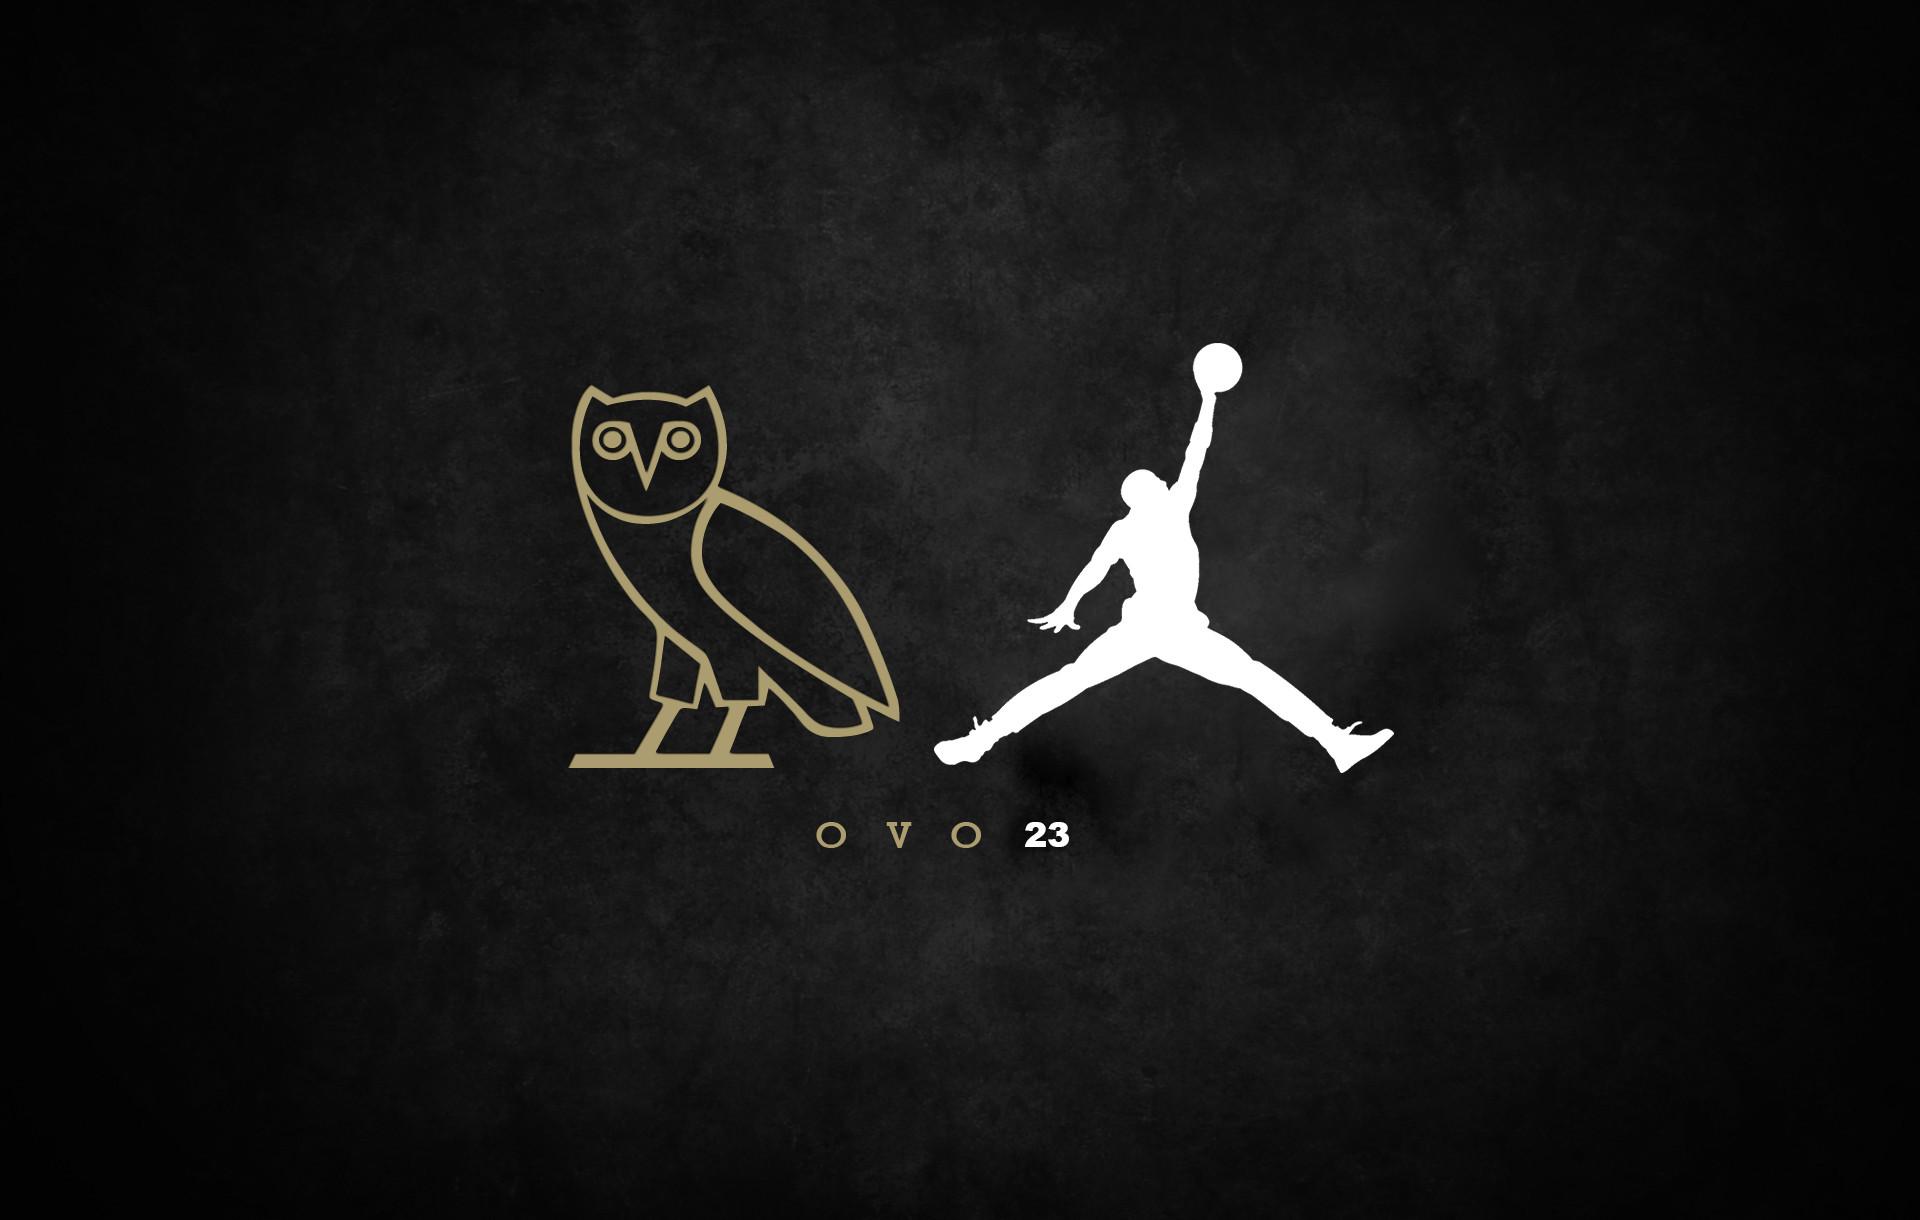 1920x1200 Michael Jordan Backgrounds 82 Wallpapers Hd